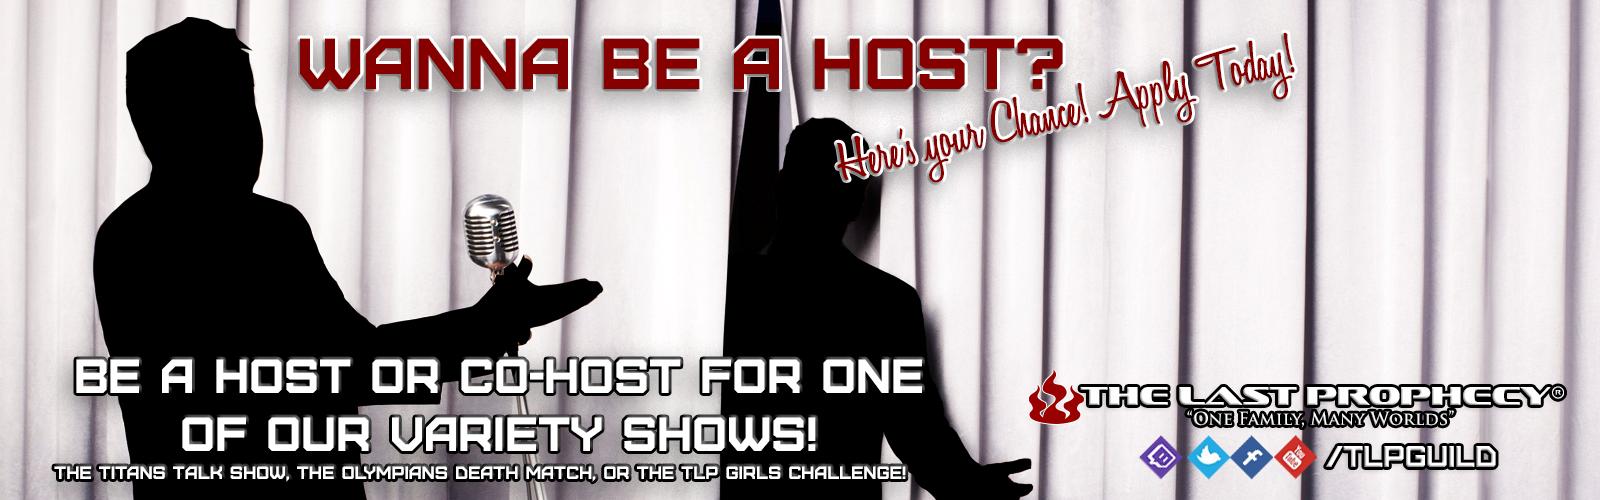 Wanna Be a Host?